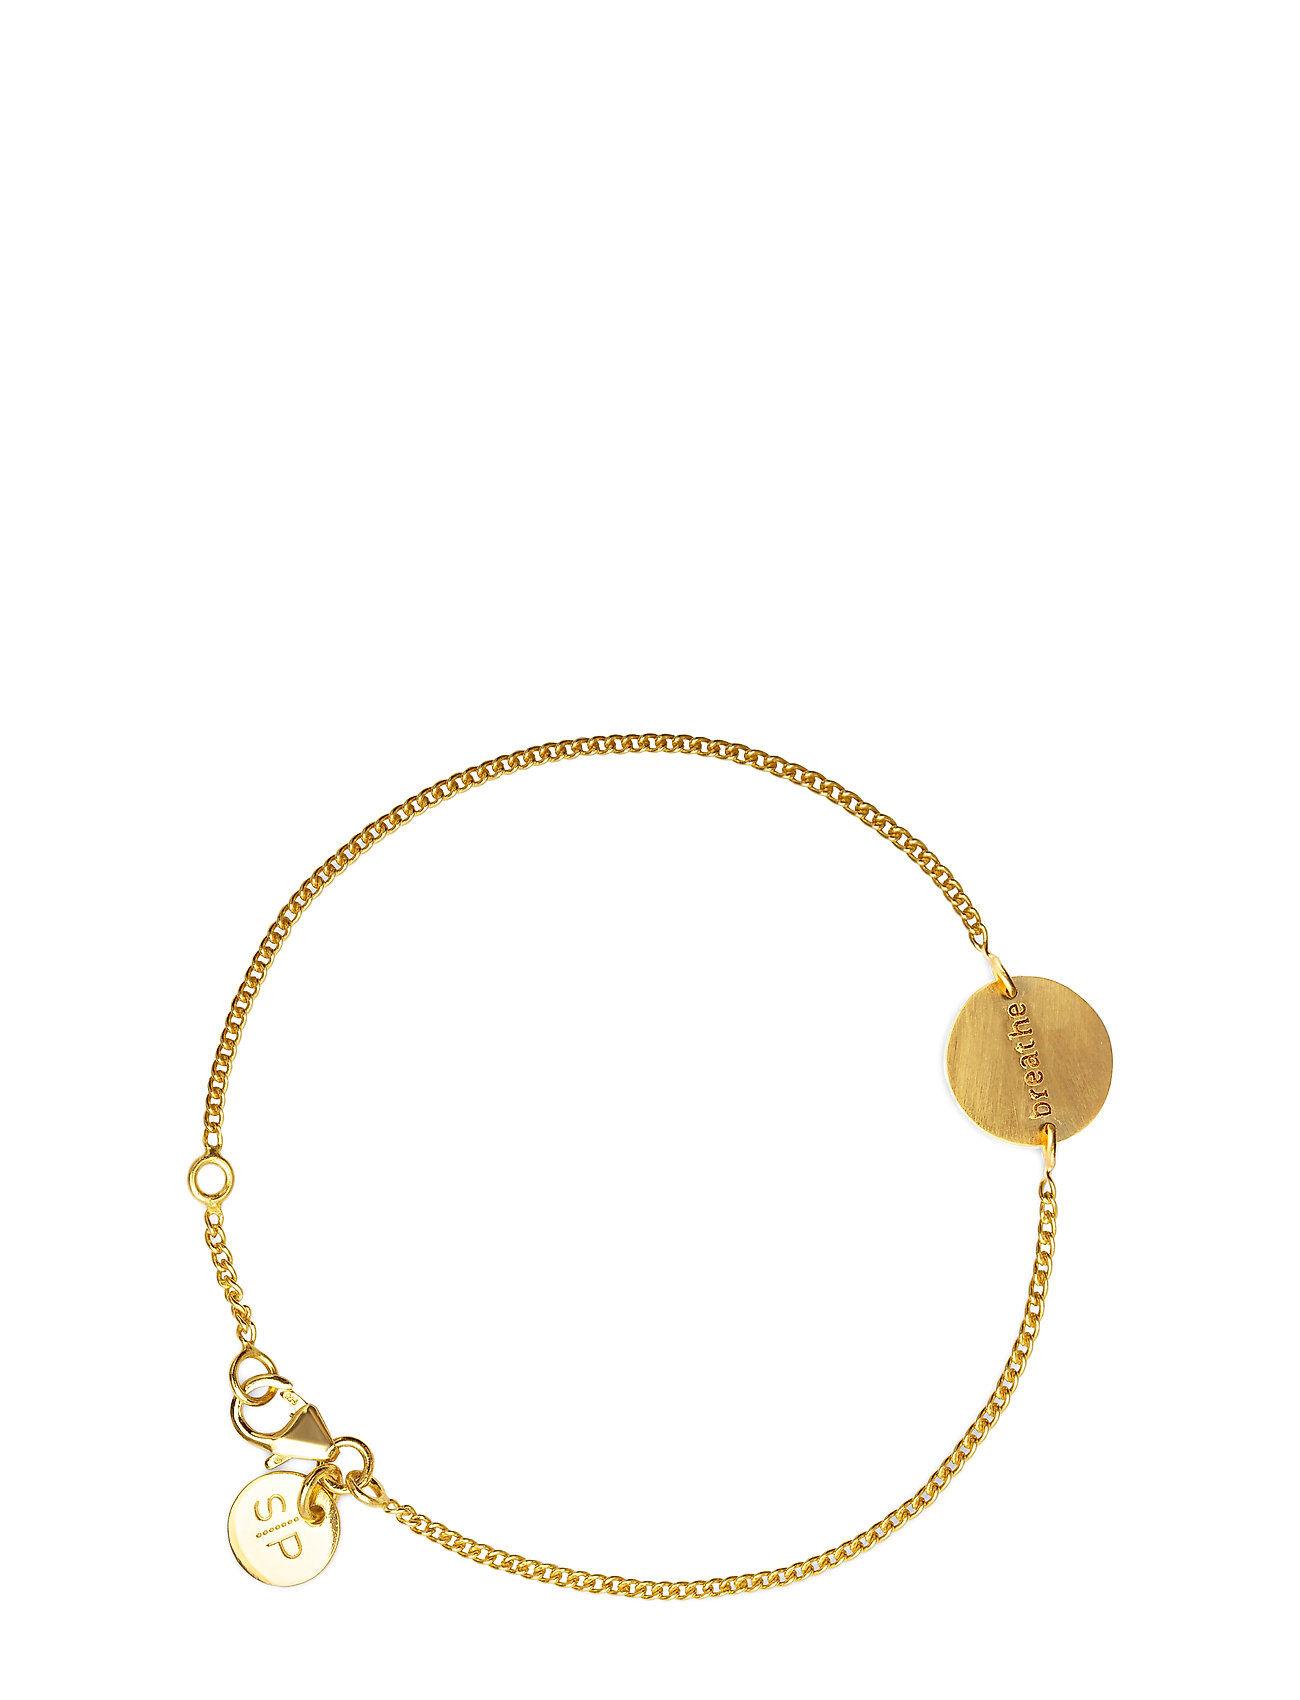 Syster P Minimalistica Breathe Bracelet Gold Accessories Jewellery Bracelets Chain Bracelets Kulta Syster P